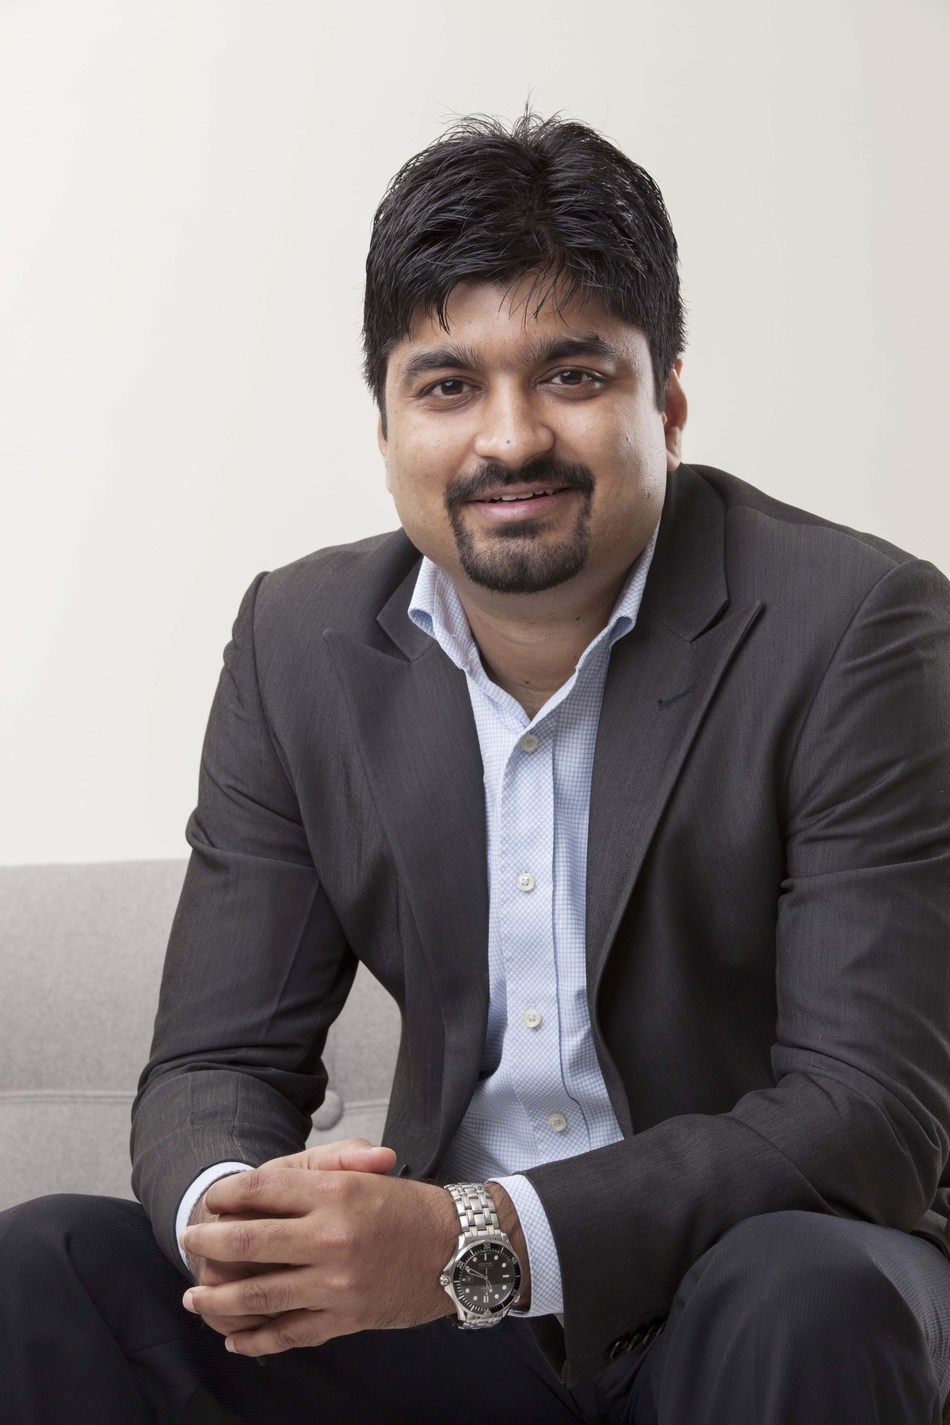 Shashank Dixit, CEO, Deskera (PRNewsfoto/Deskera)